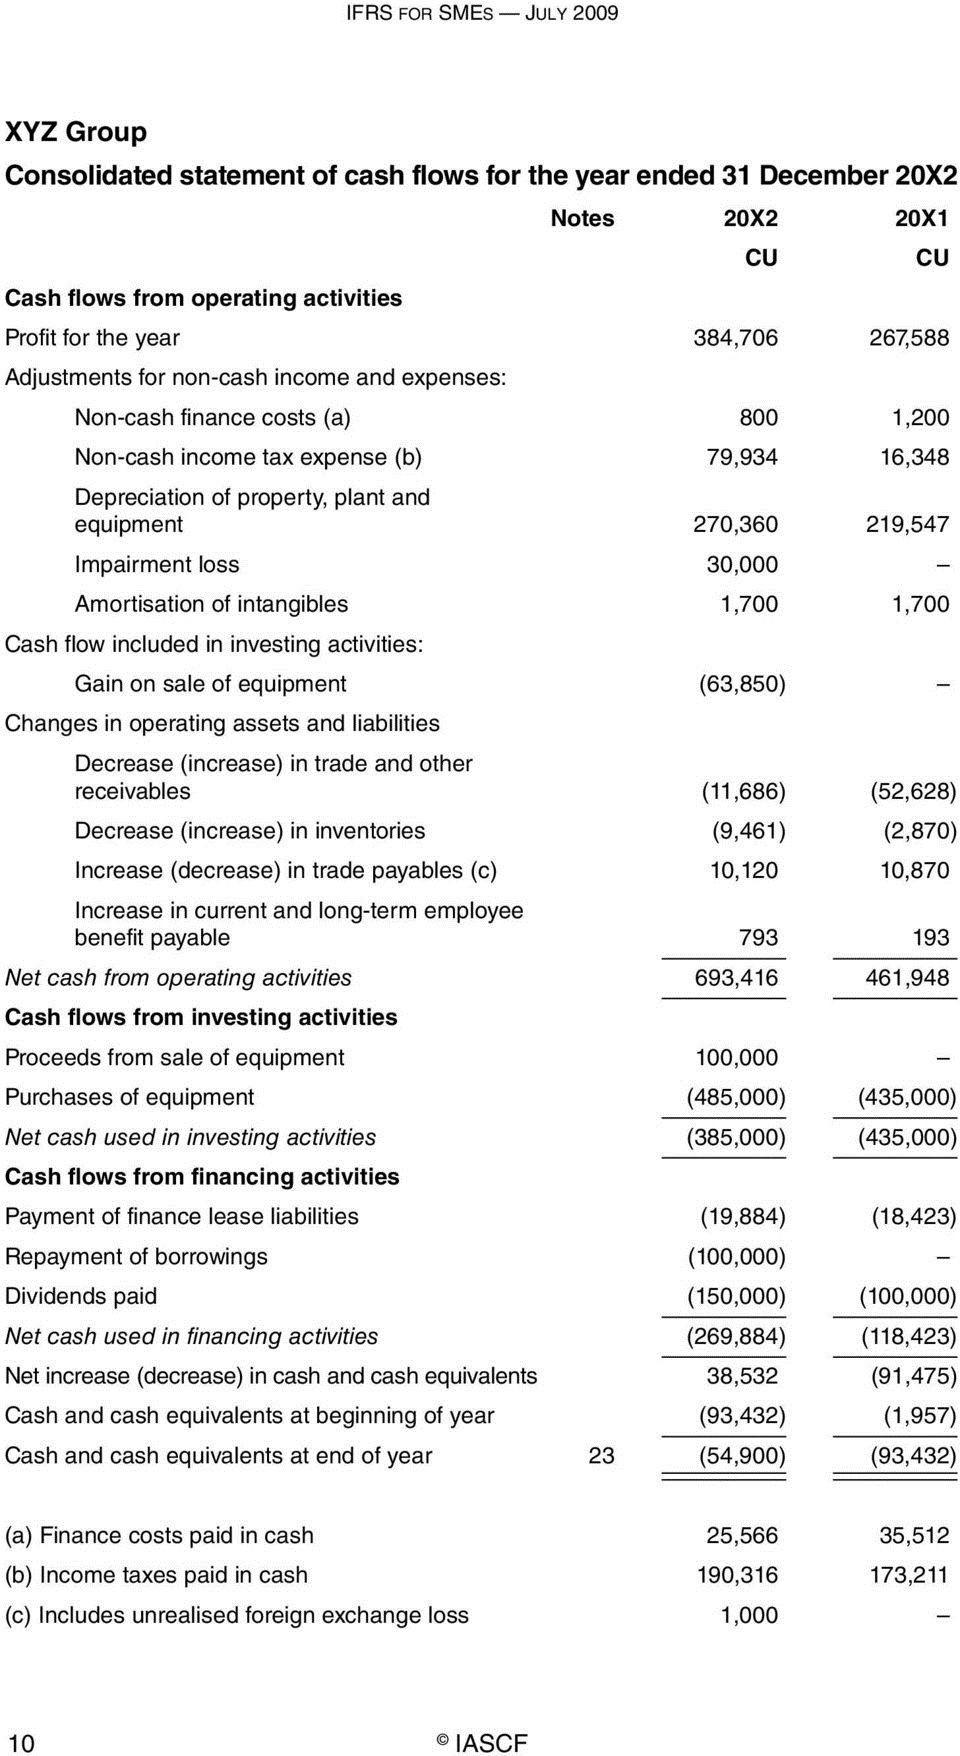 008 Unbelievable Statement Of Cash Flow Template Ifr Design  Excel960